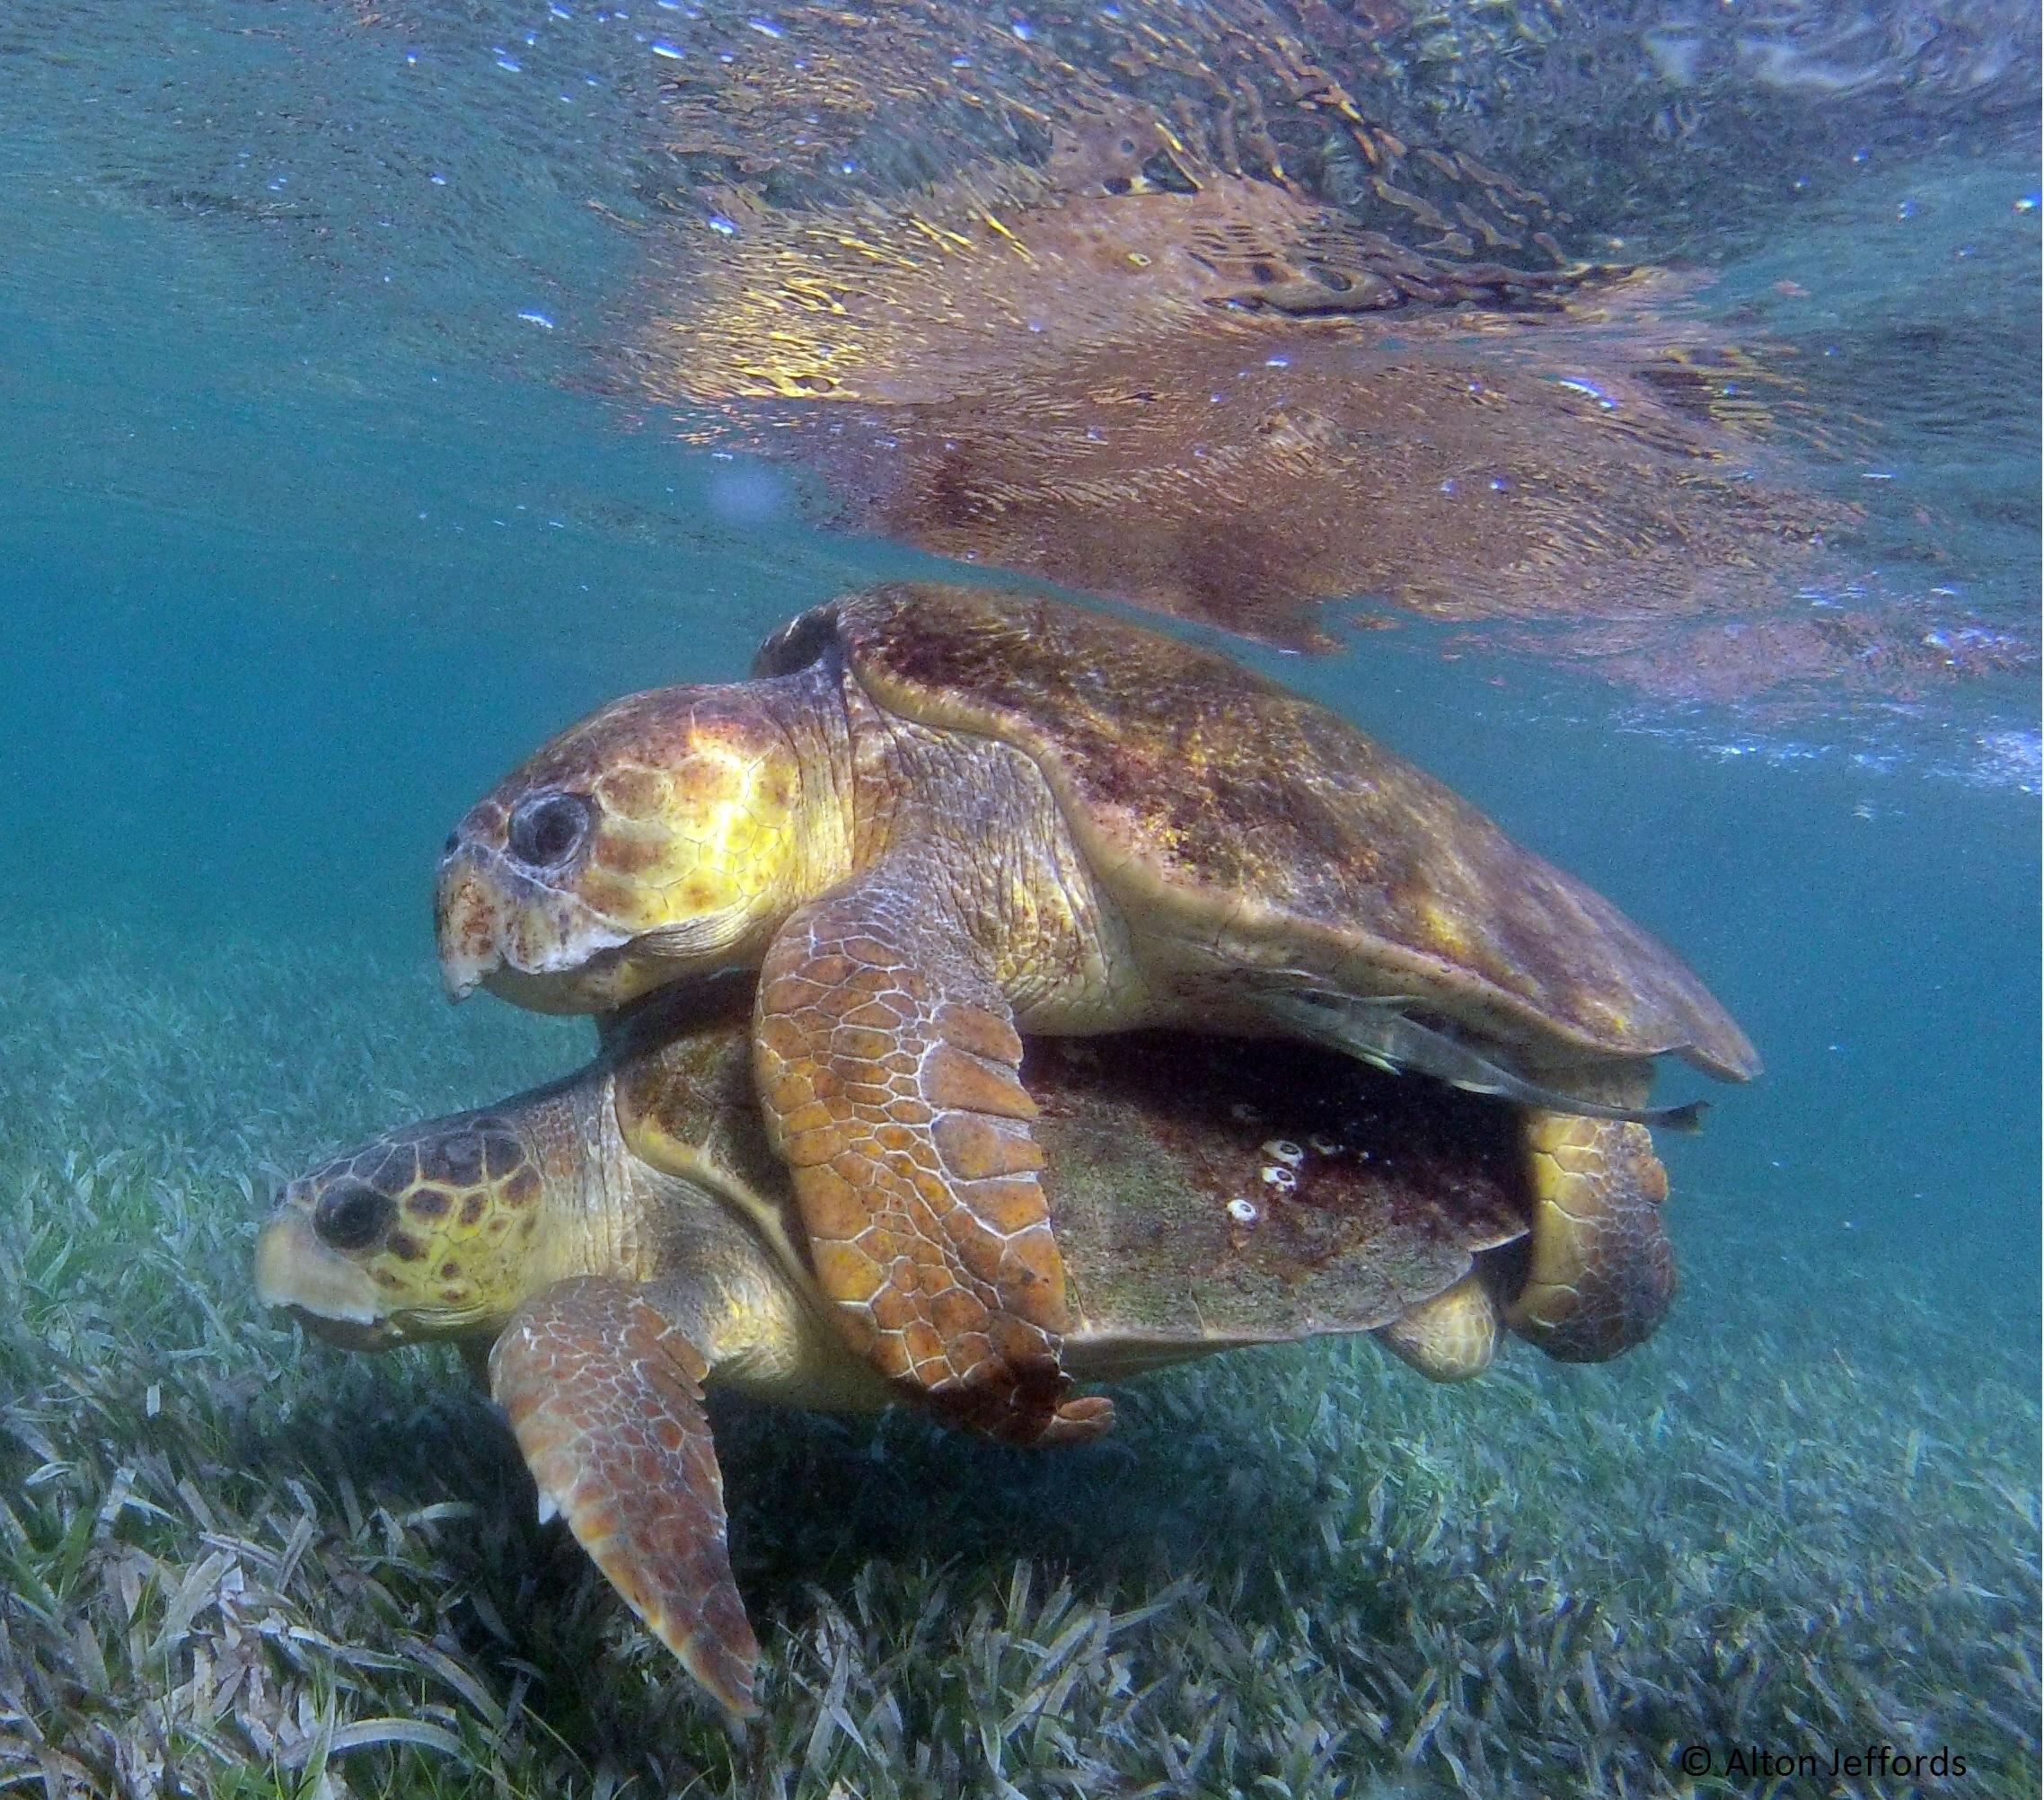 Loggerhead turtles mating at Turneffe Atoll. © Alton Jeffords